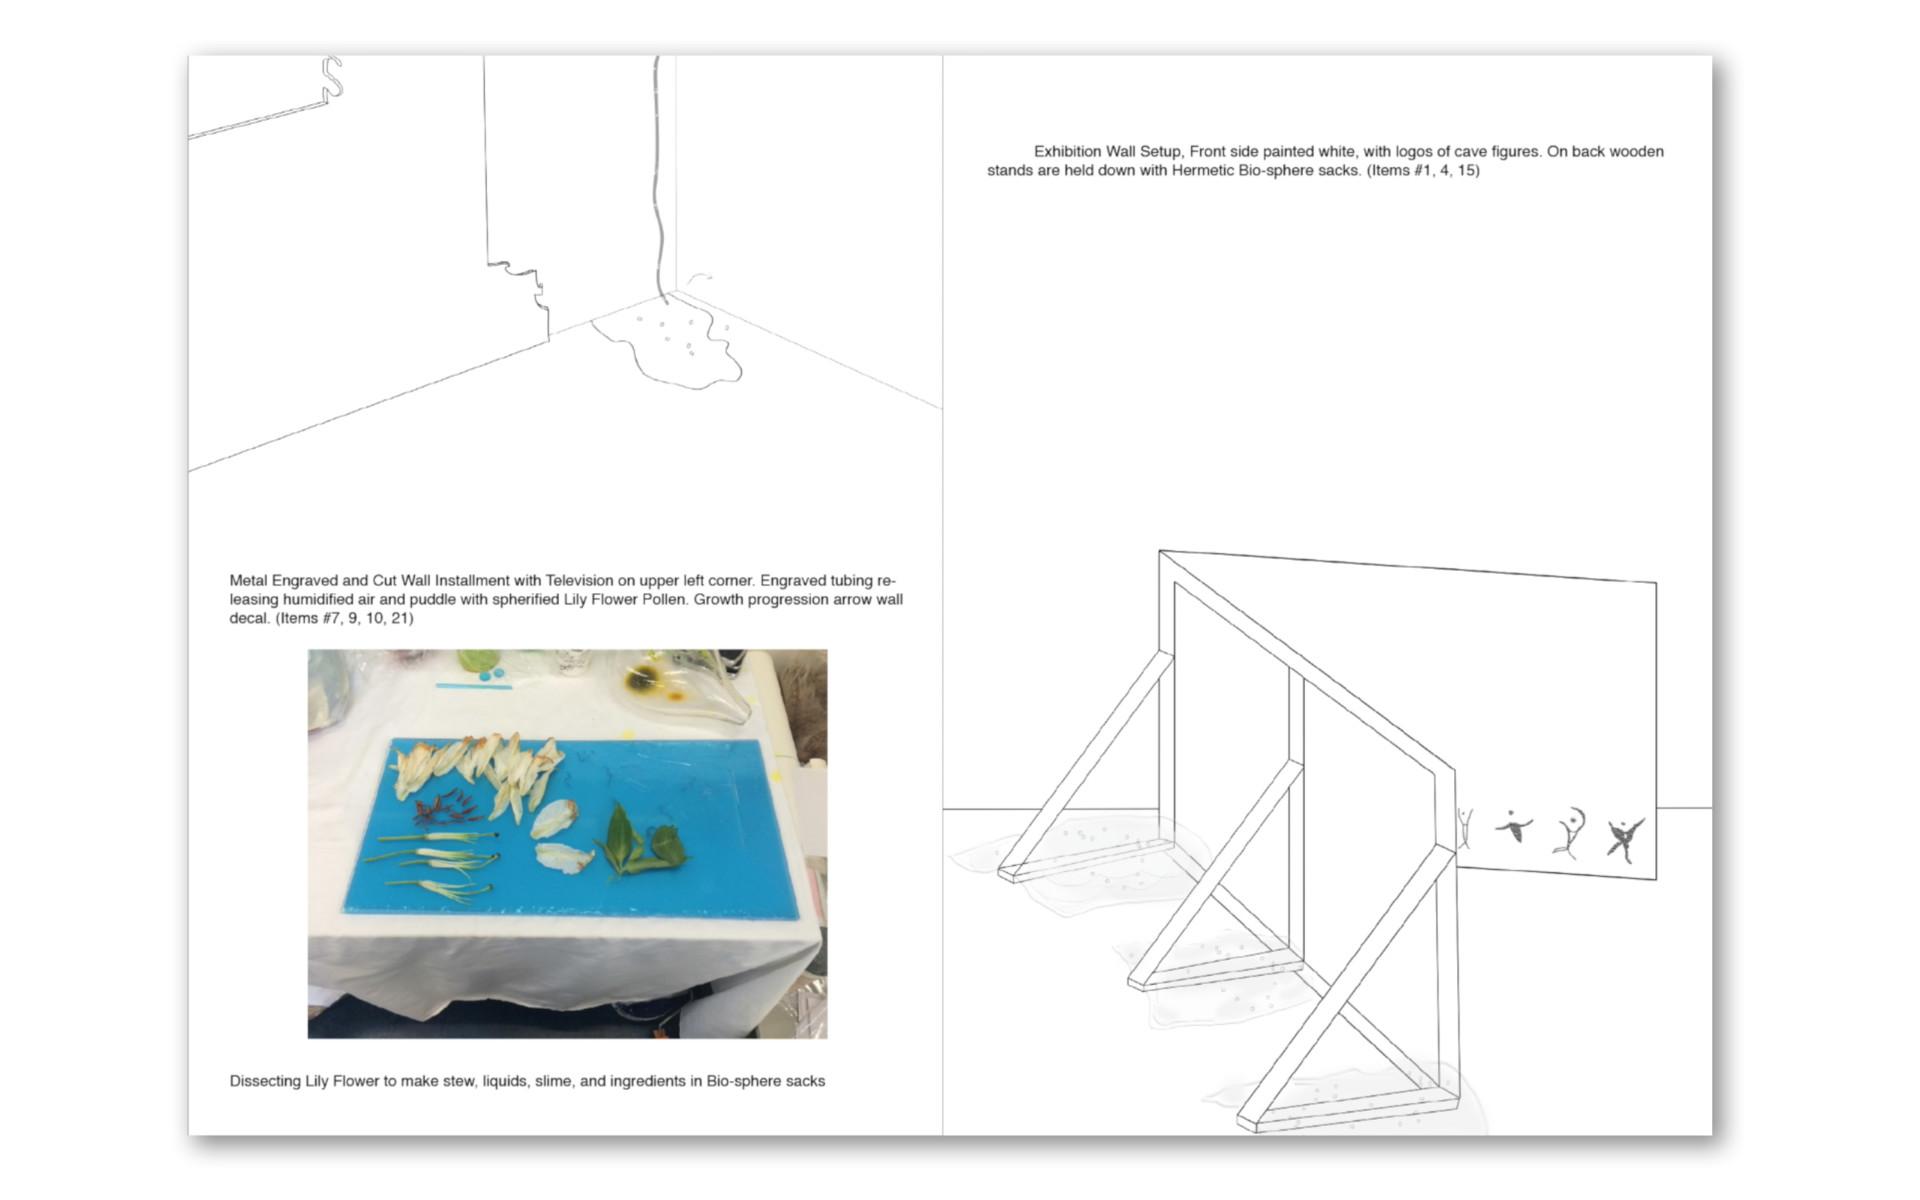 Lara Joy Evans Catalogue of an Immaterial Exhibition